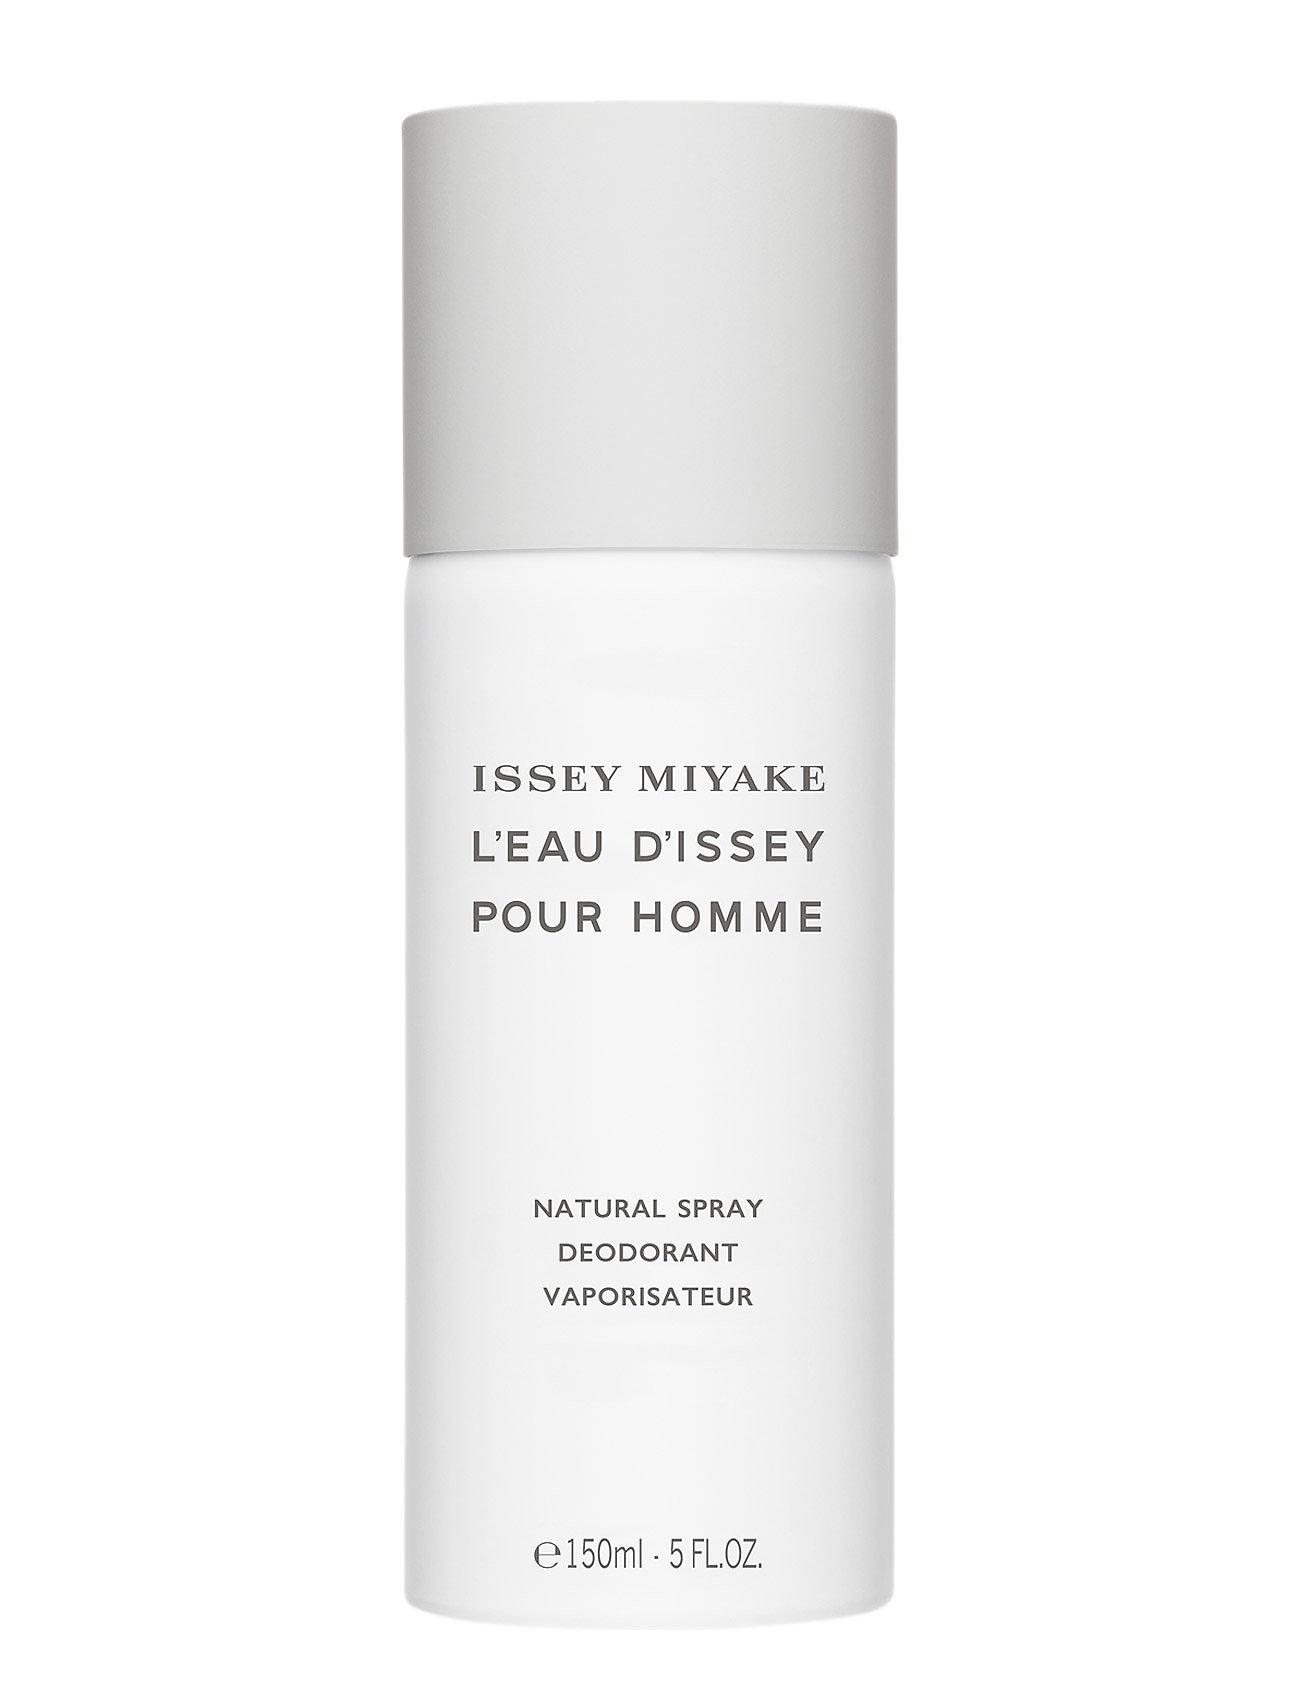 issey miyake Issey miyake li pour homme deodoran fra boozt.com dk